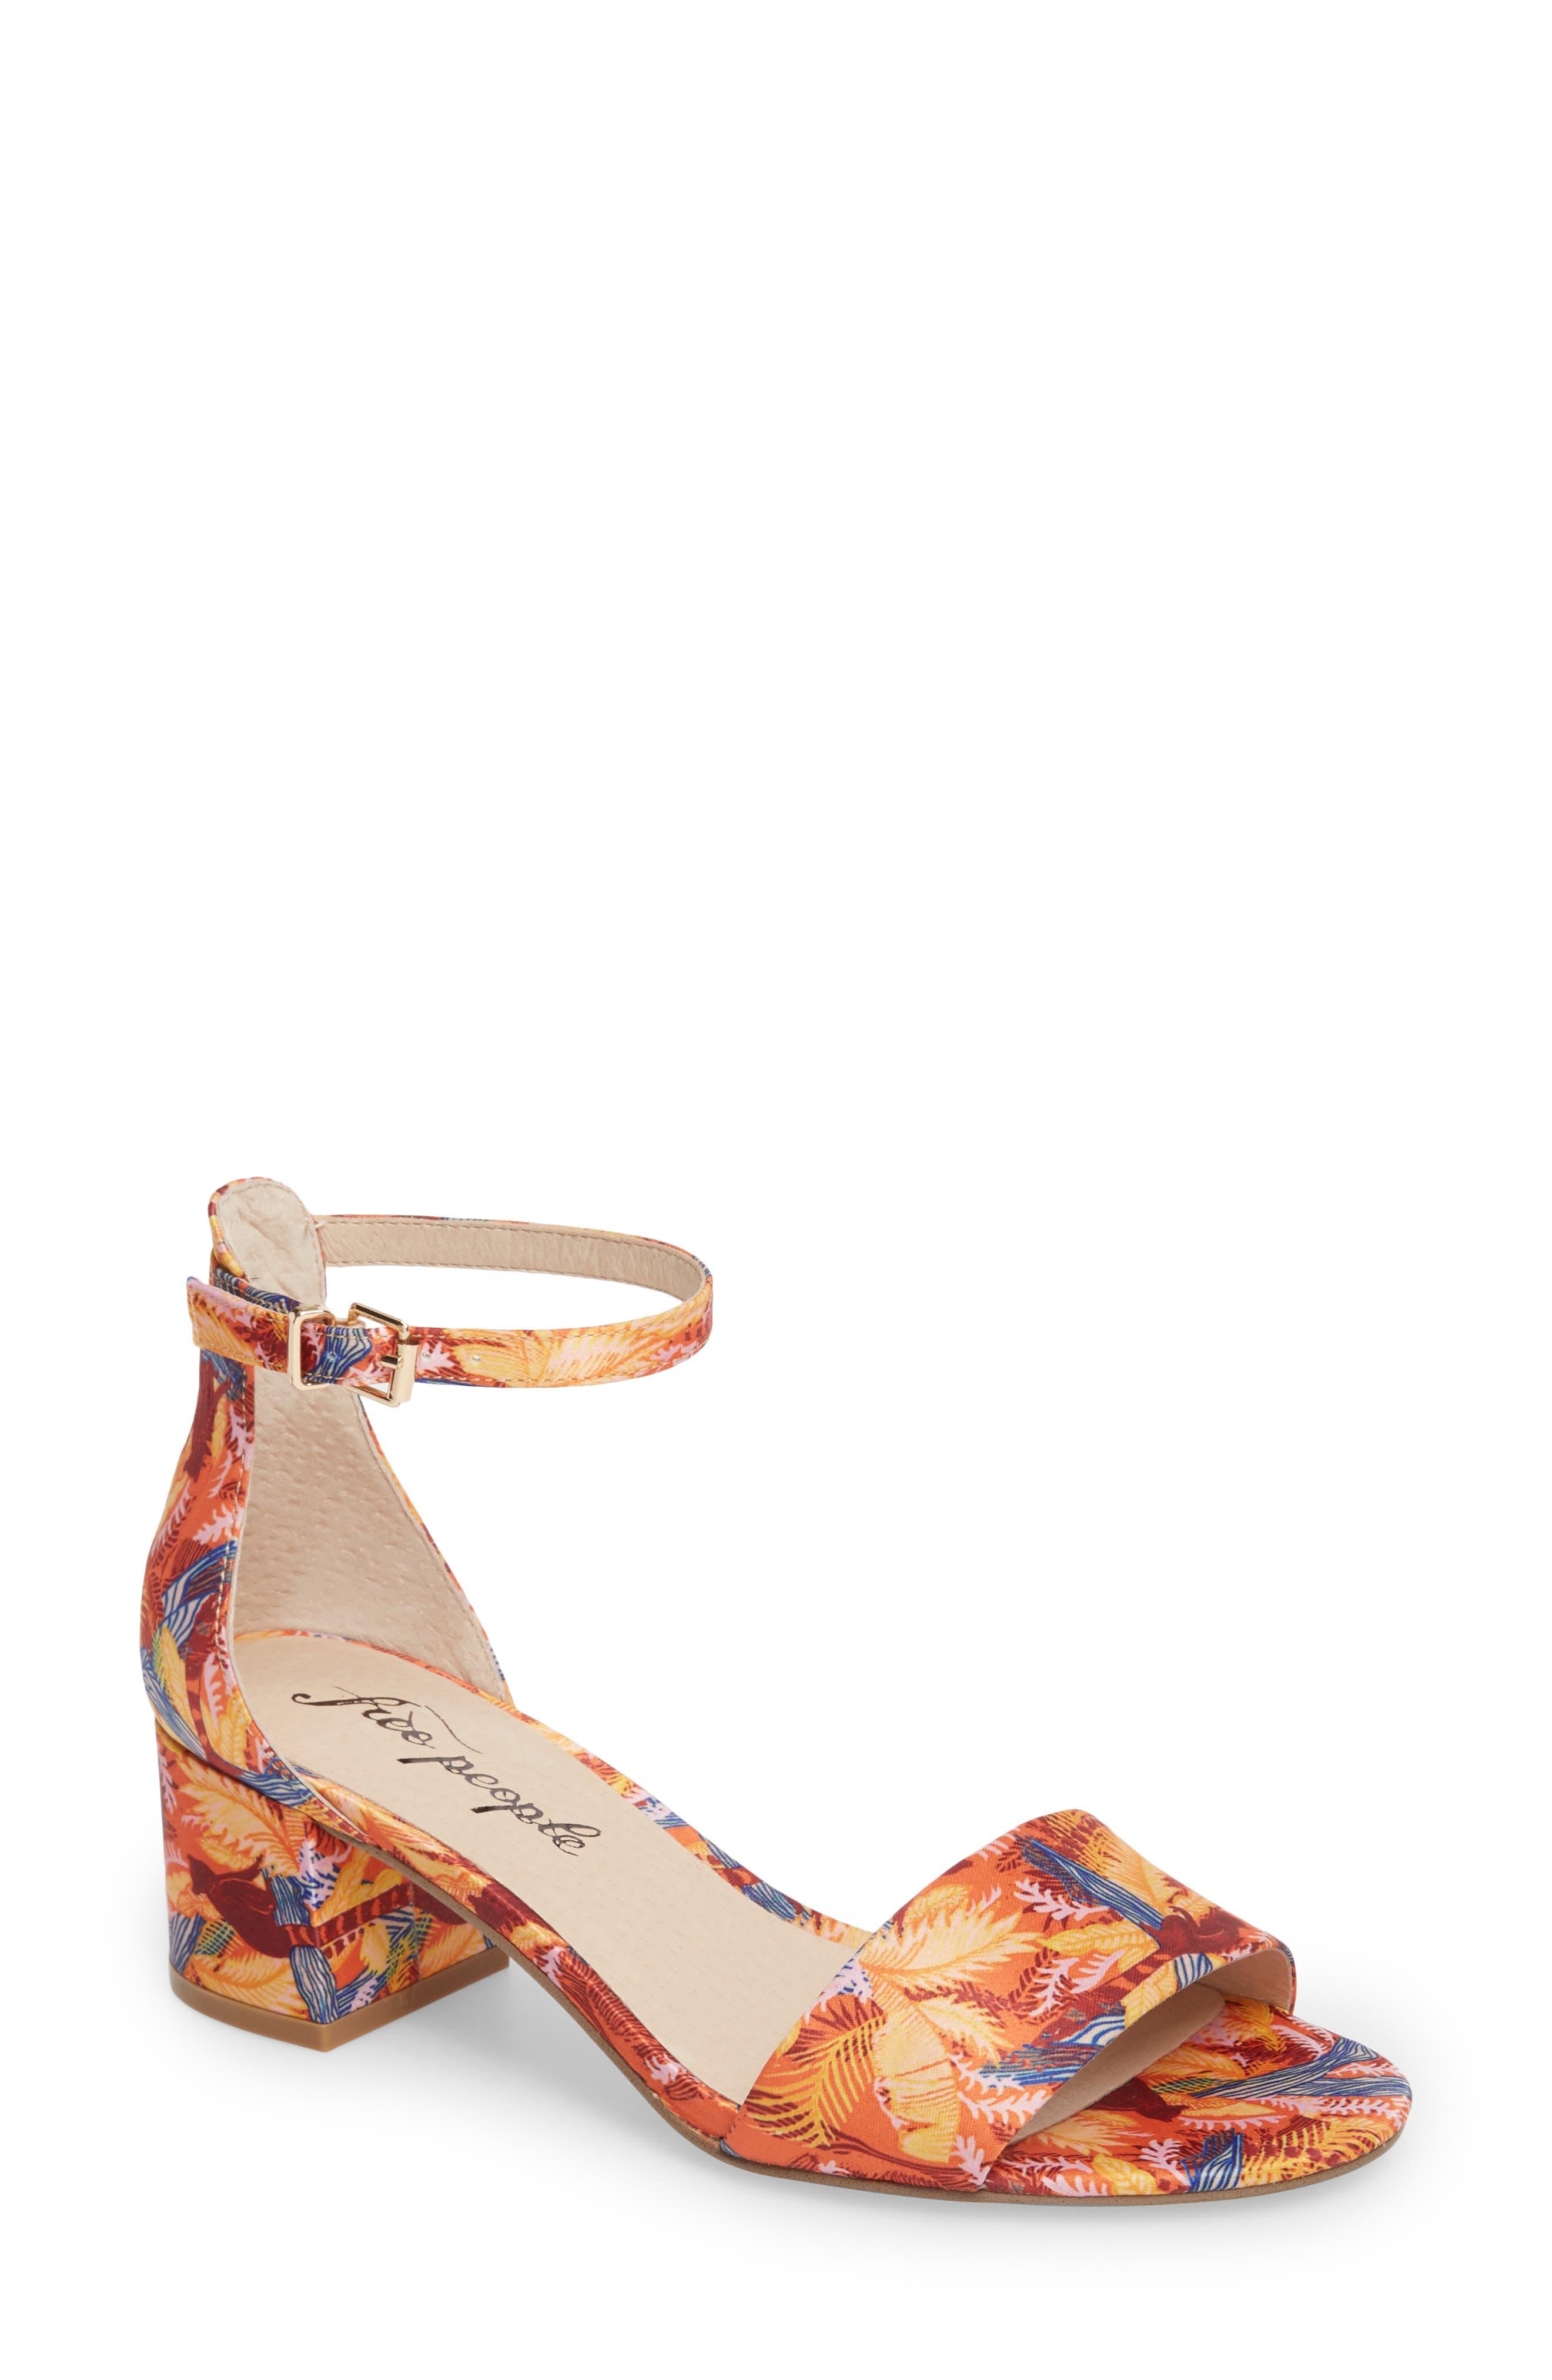 Marigold Block Heel Sandal,                         Main,                         color, Orange Combo